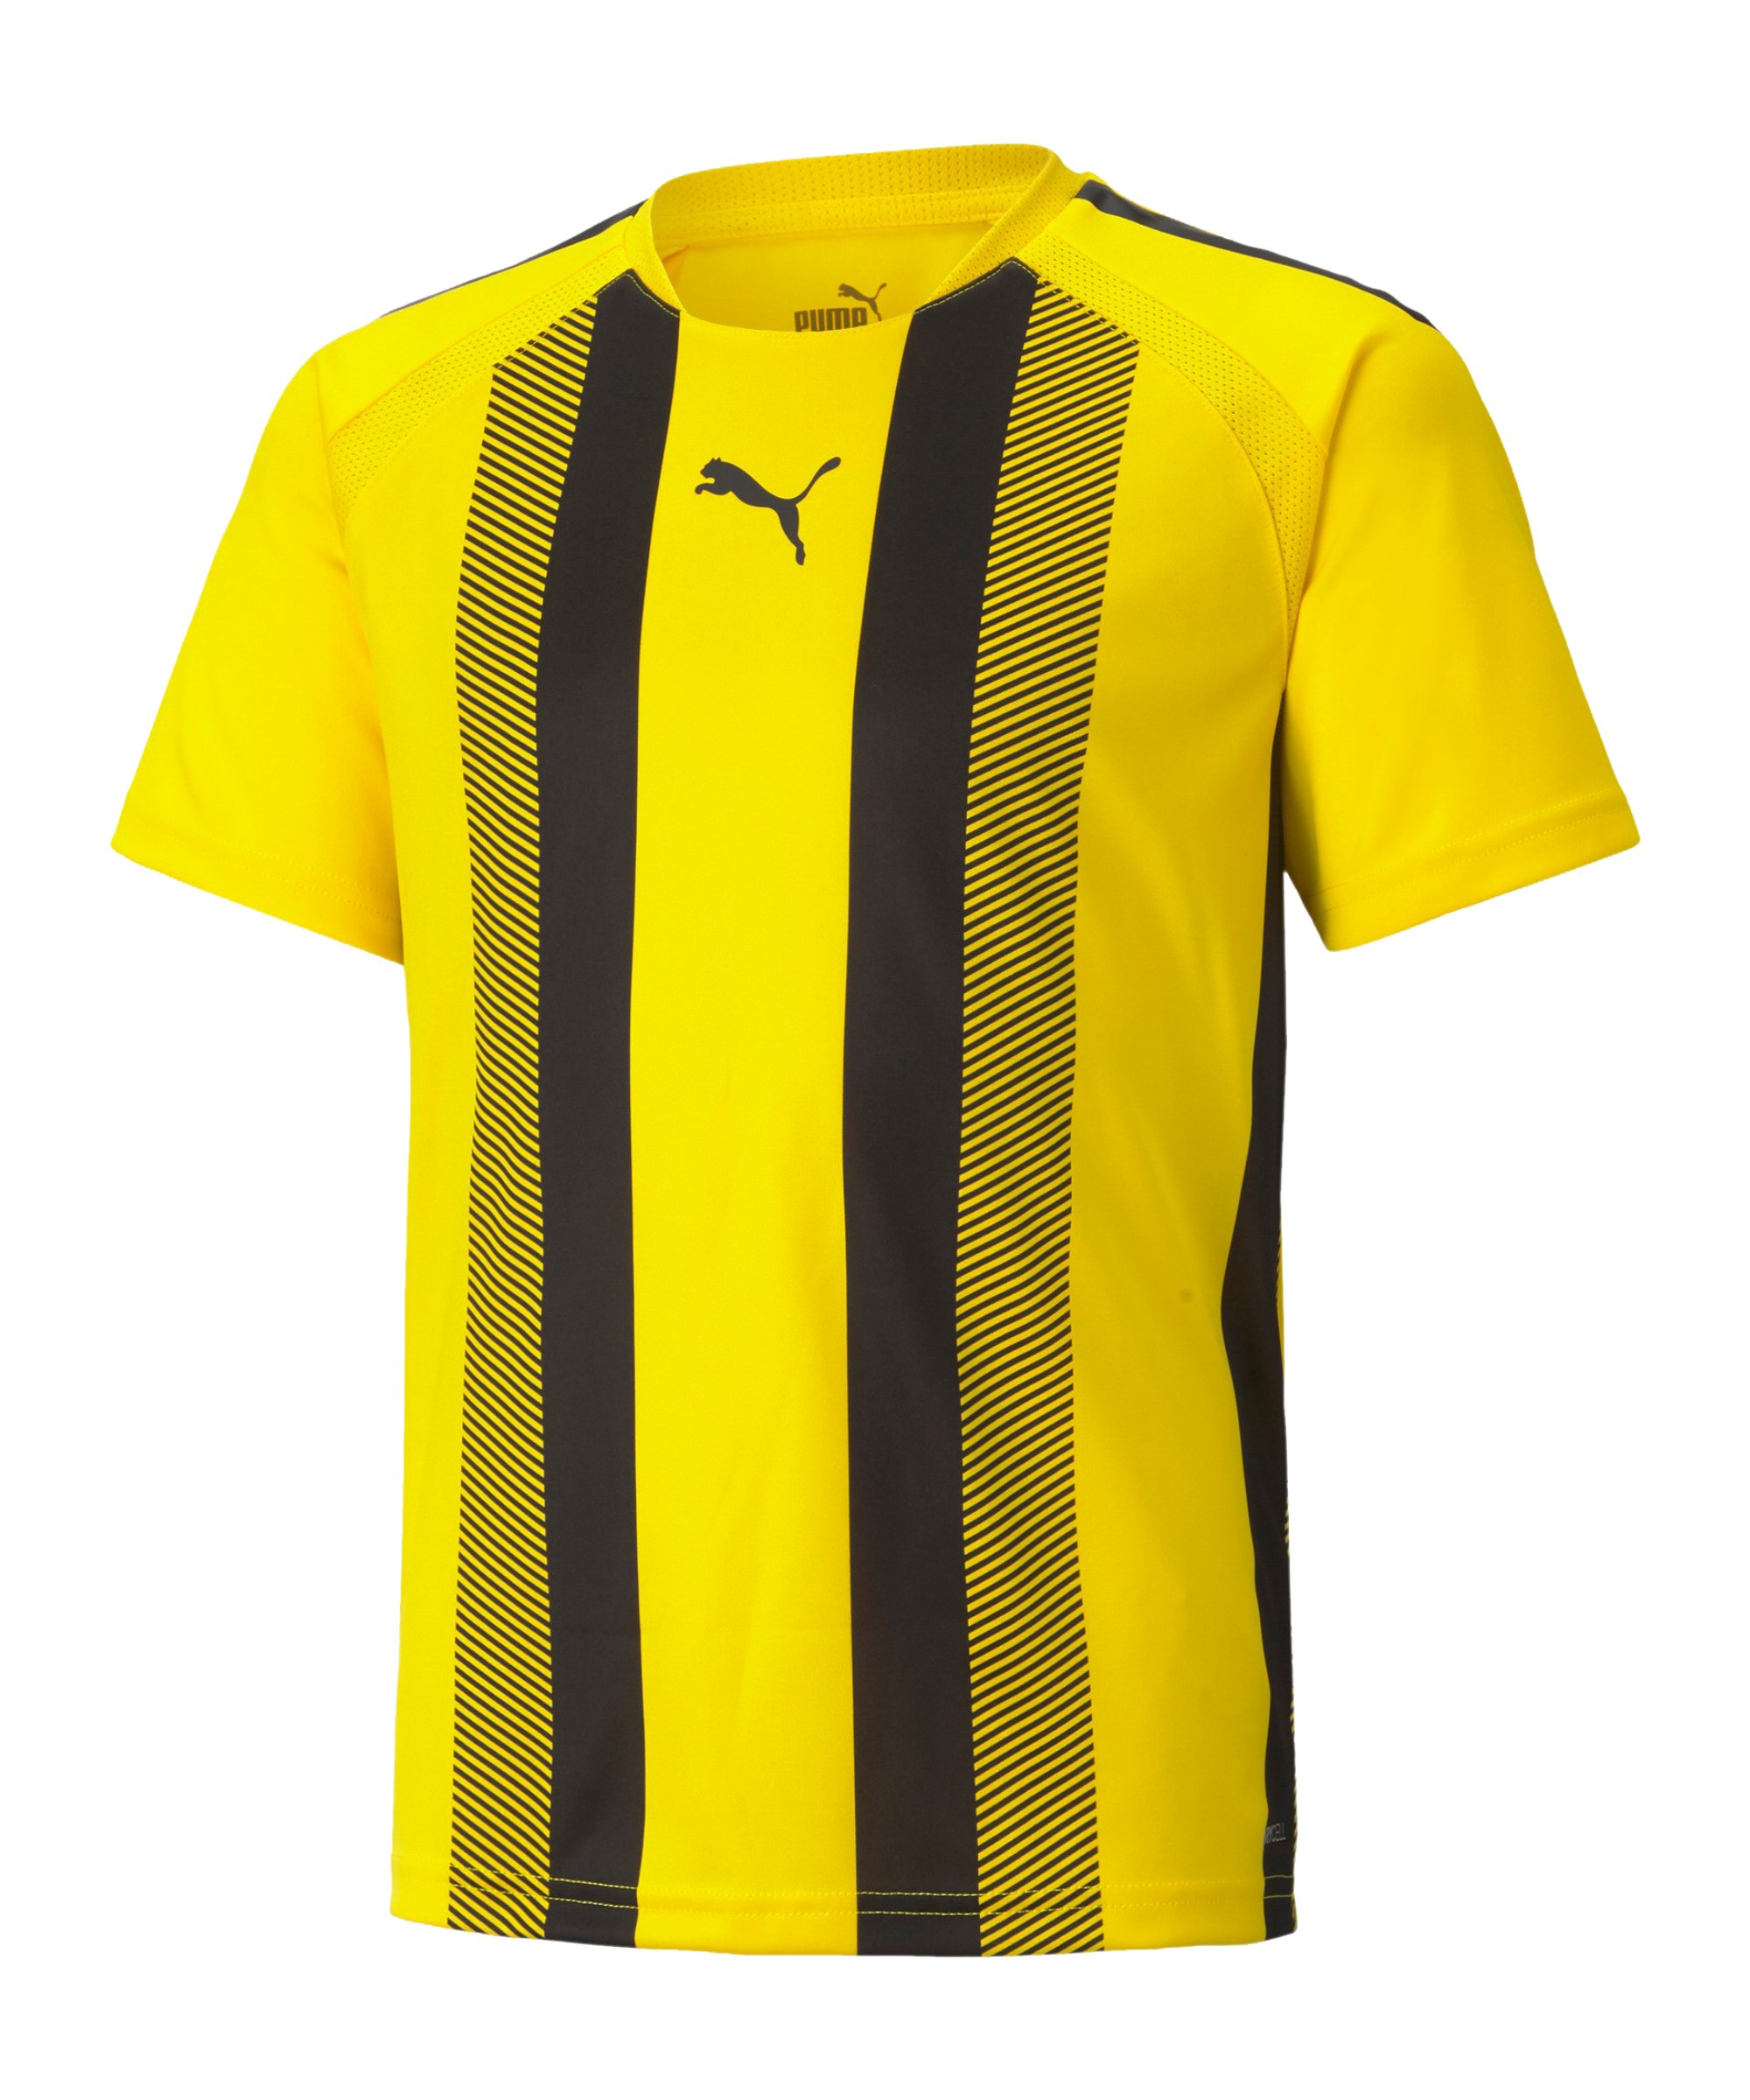 PUMA teamLIGA Striped Trikot Kids Gelb Schwarz F07 - gelb